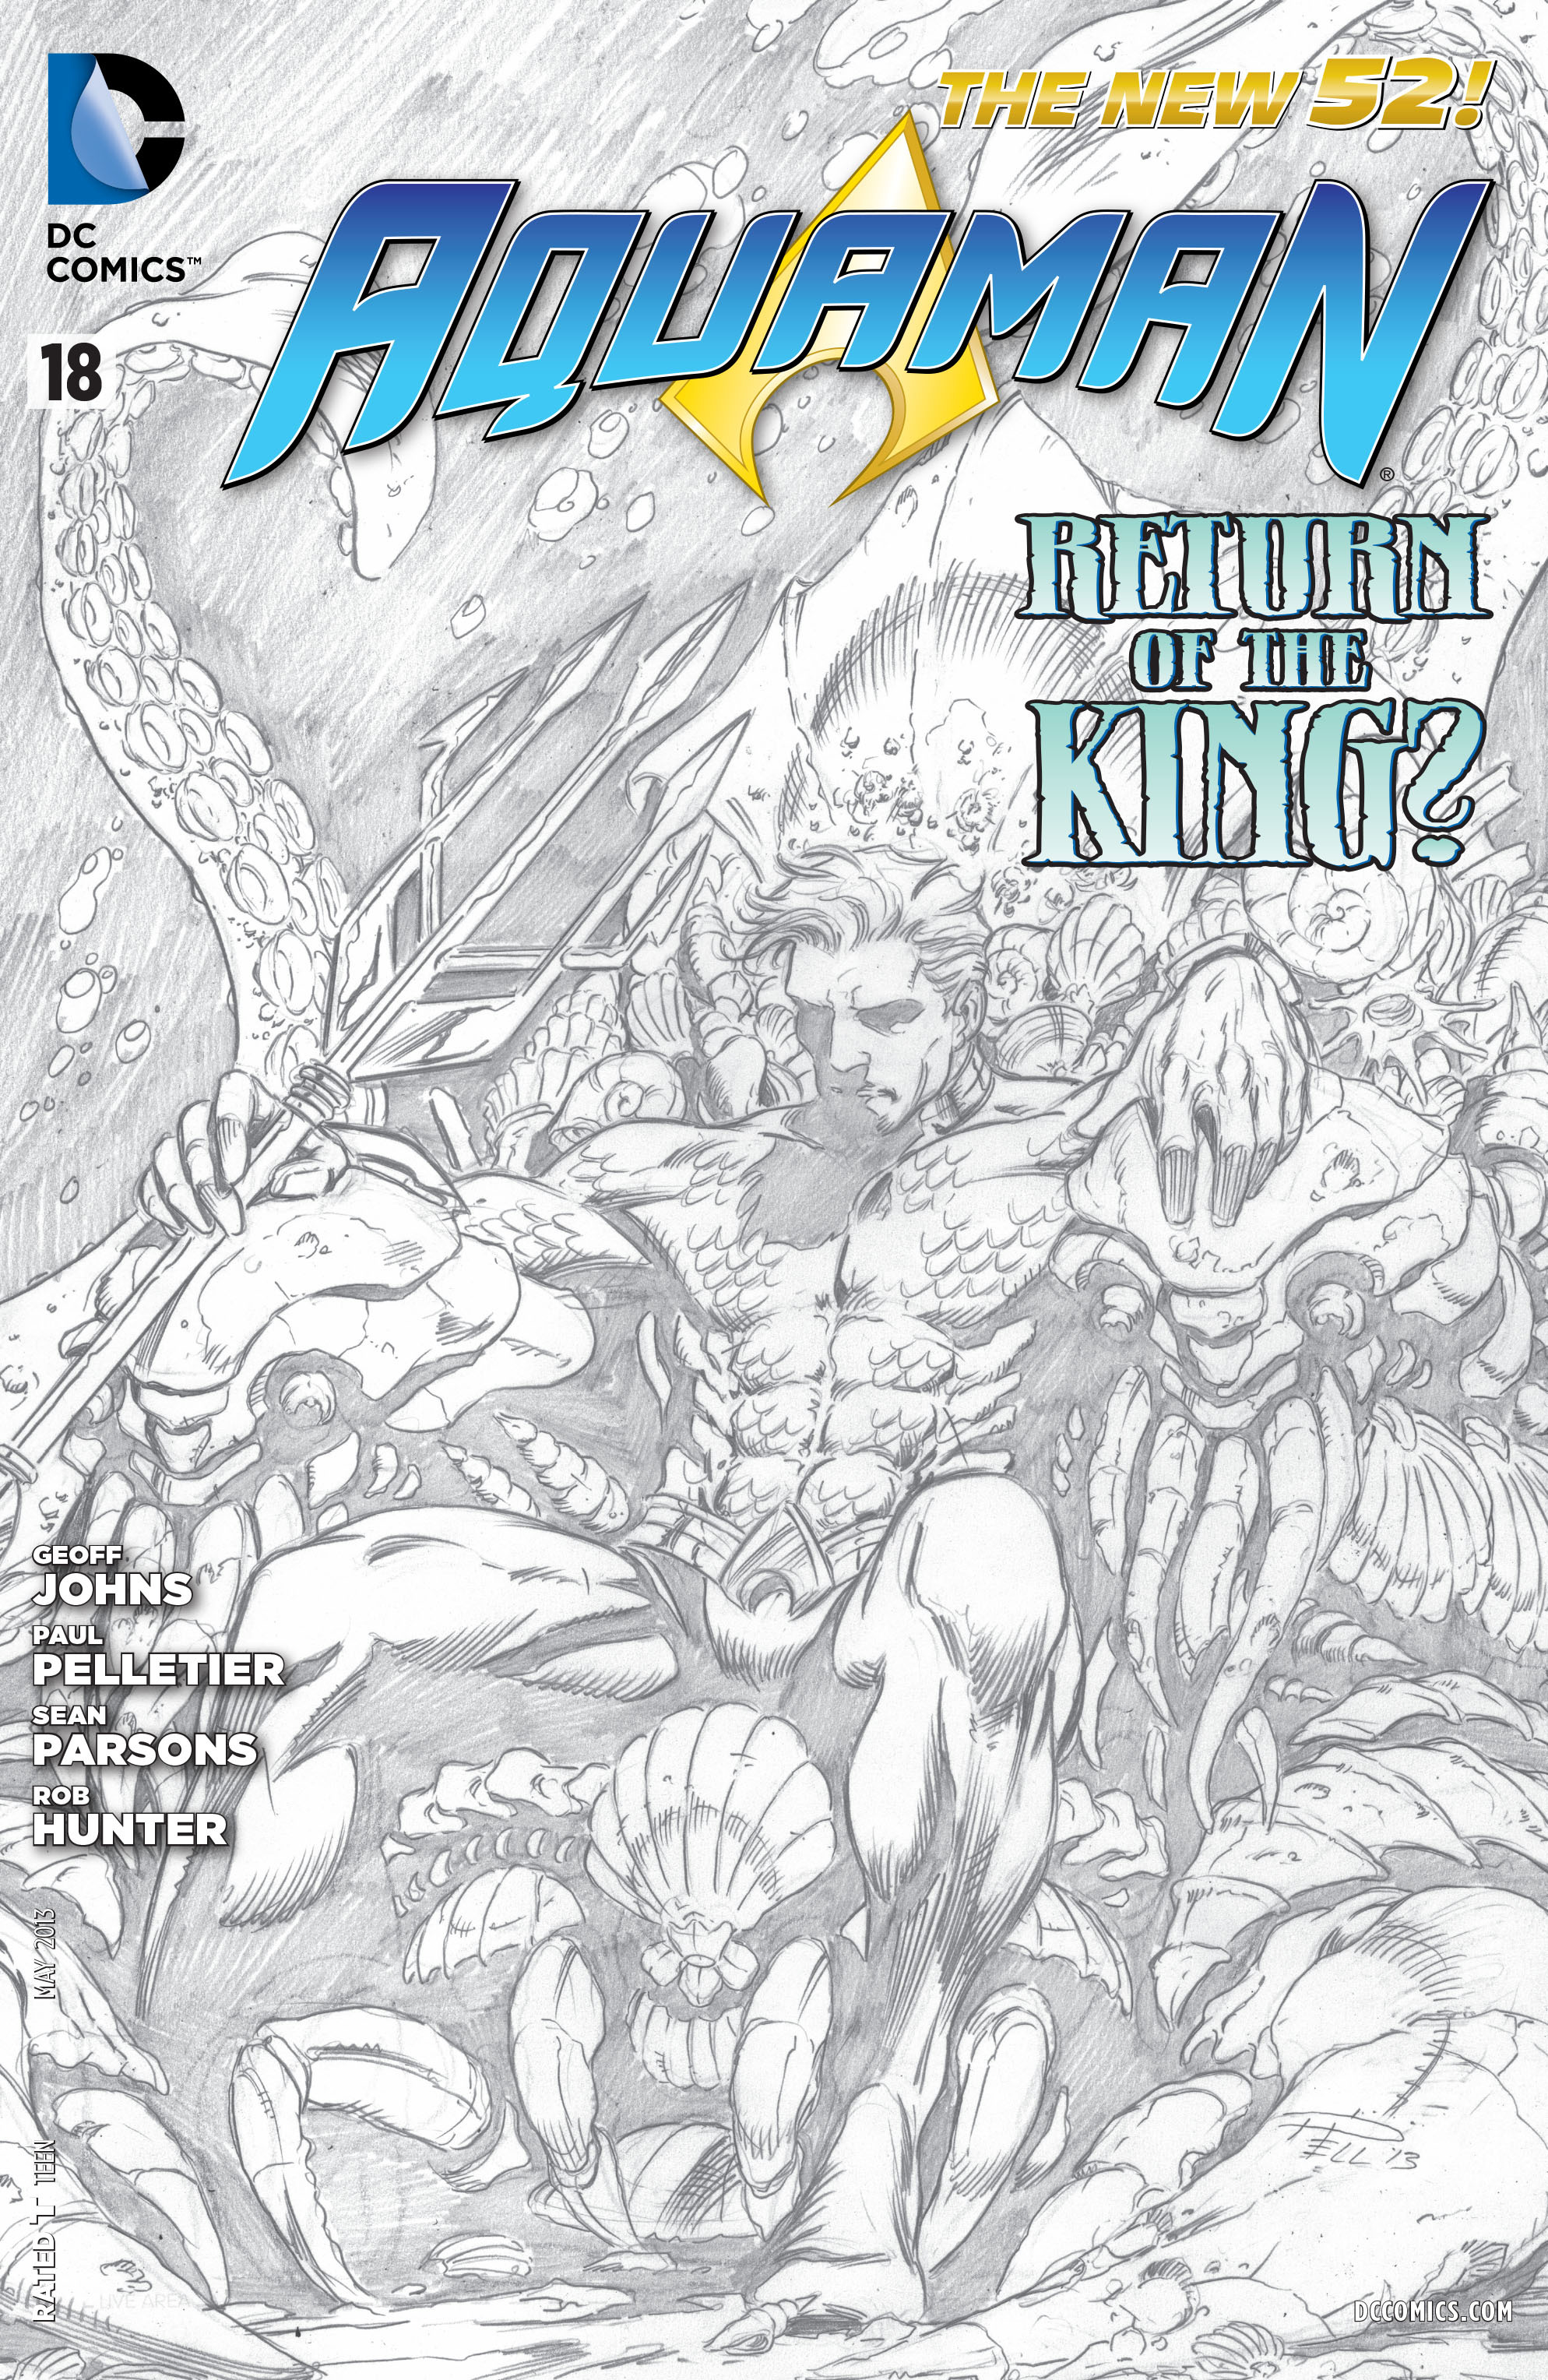 Read online Aquaman (2011) comic -  Issue #18 - 21